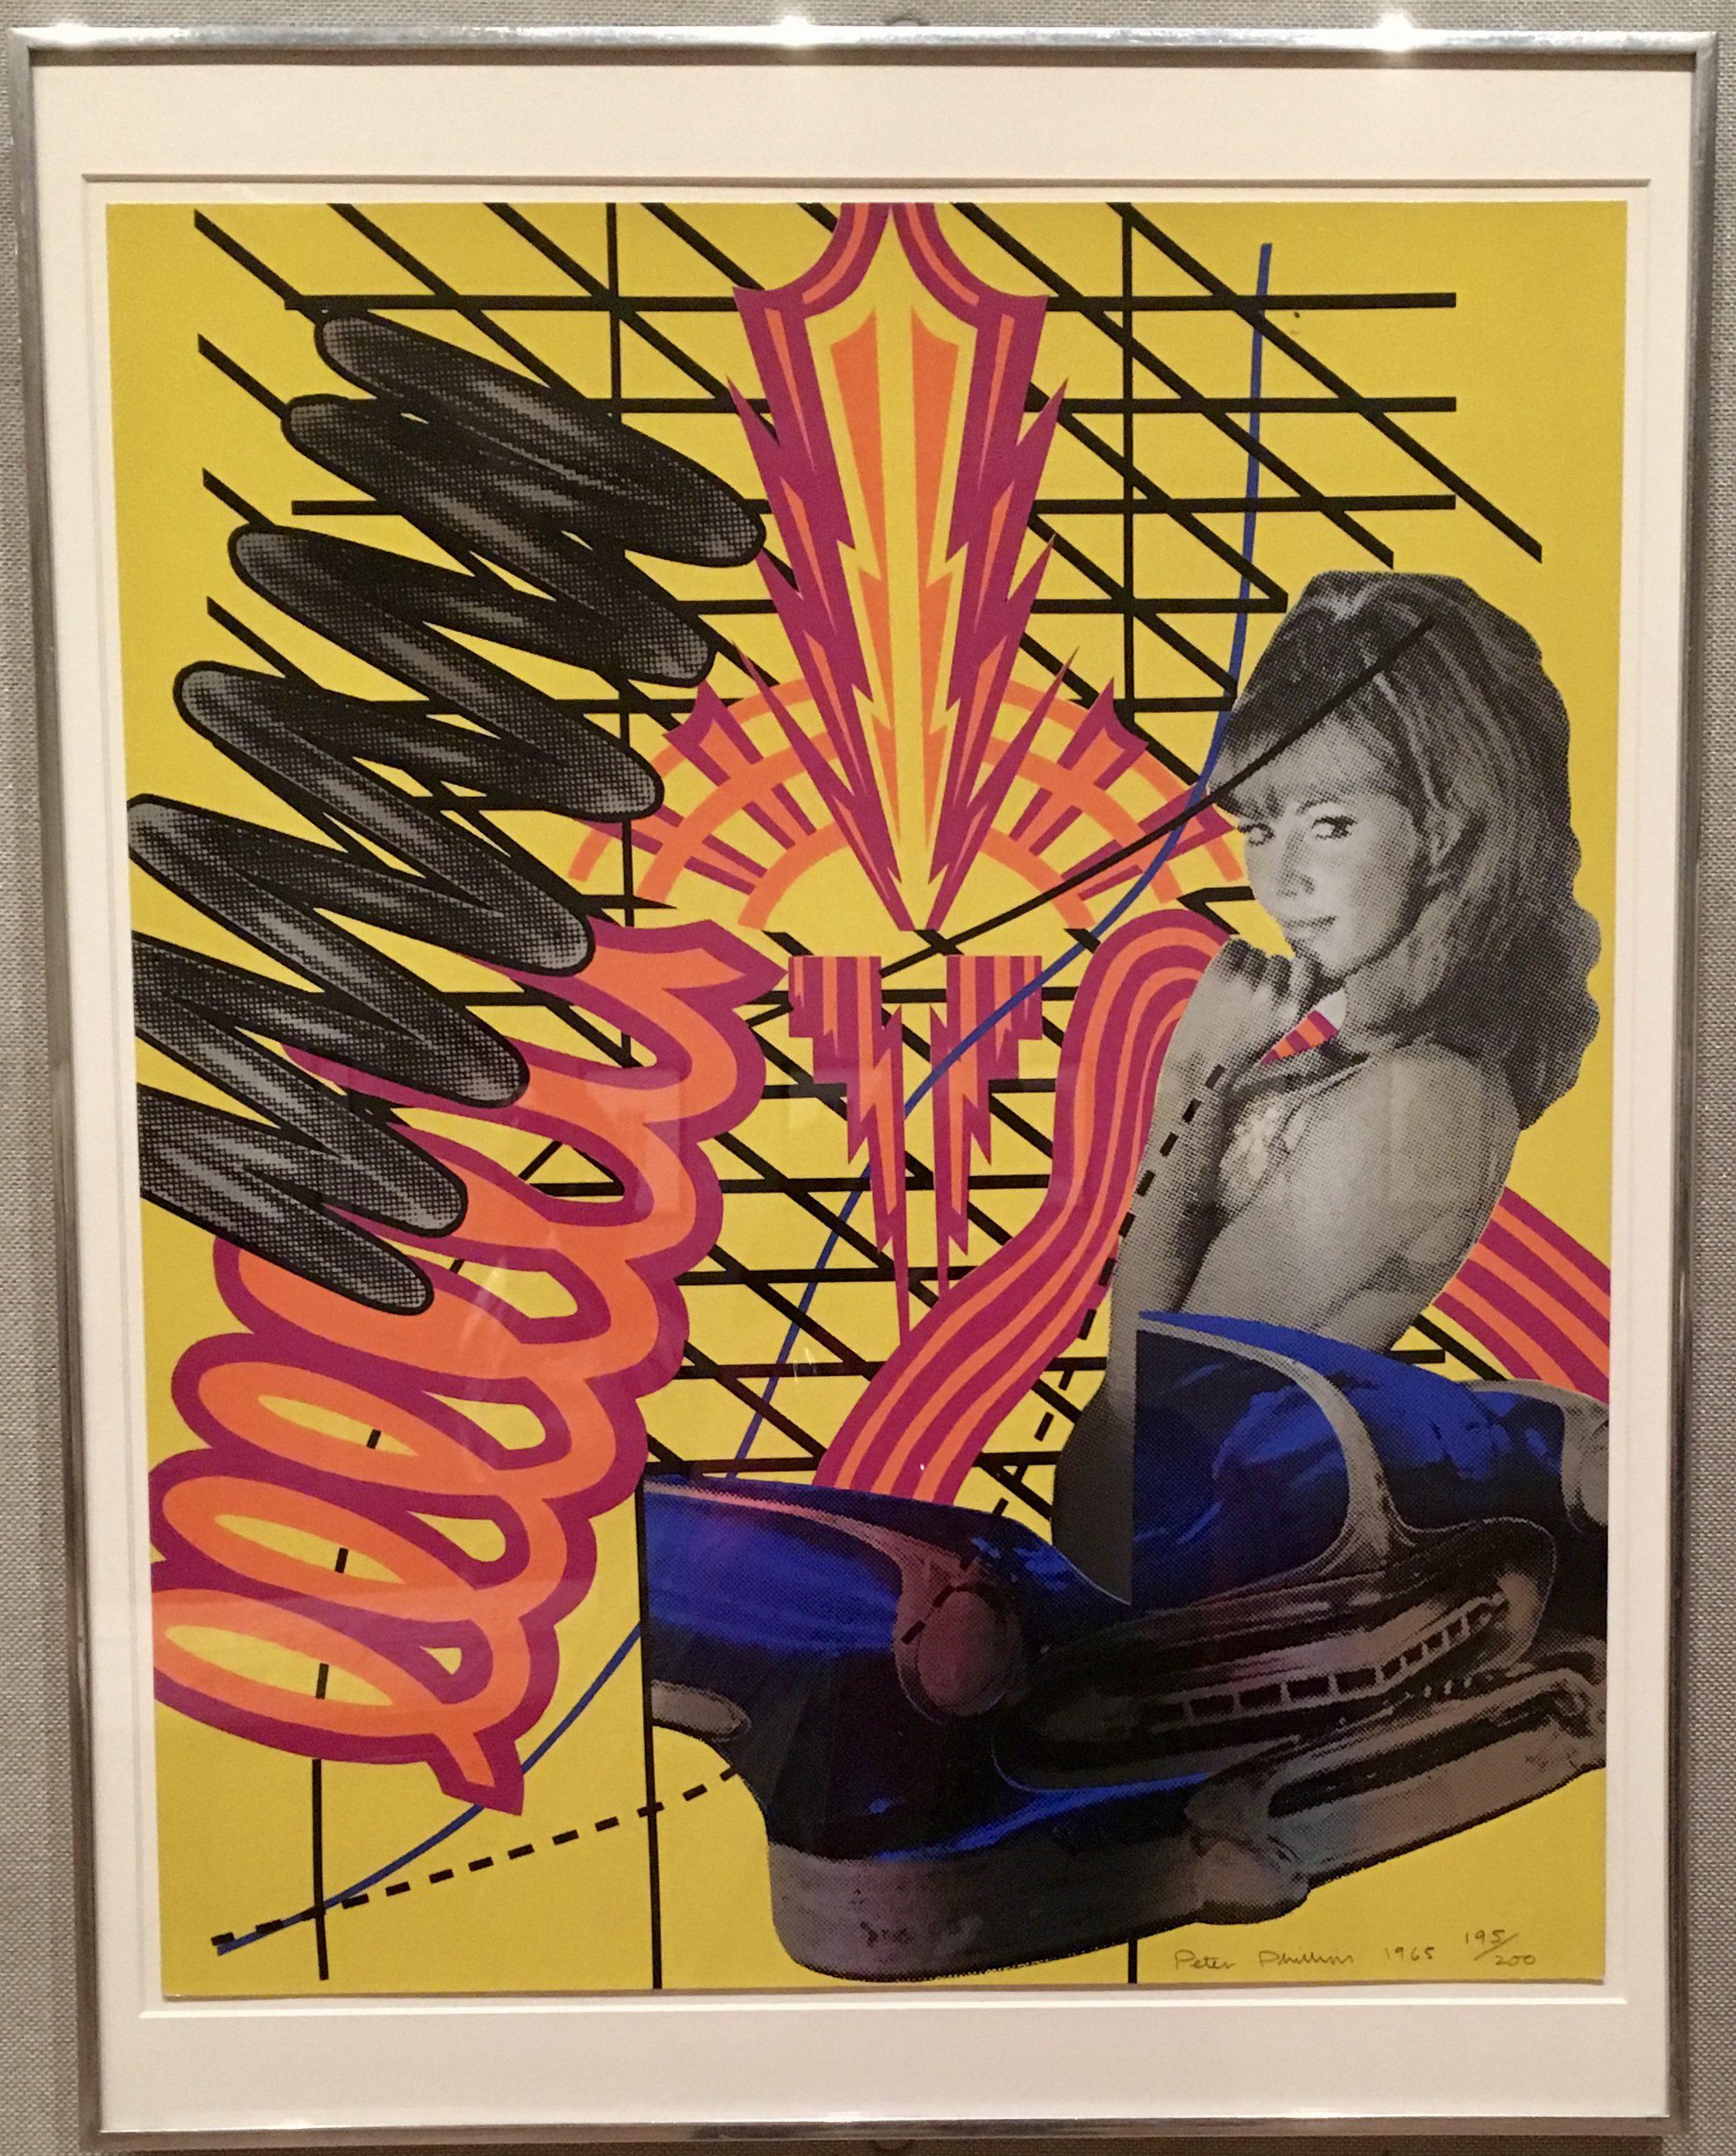 modern art monday presents custom print 1 by peter phillips the